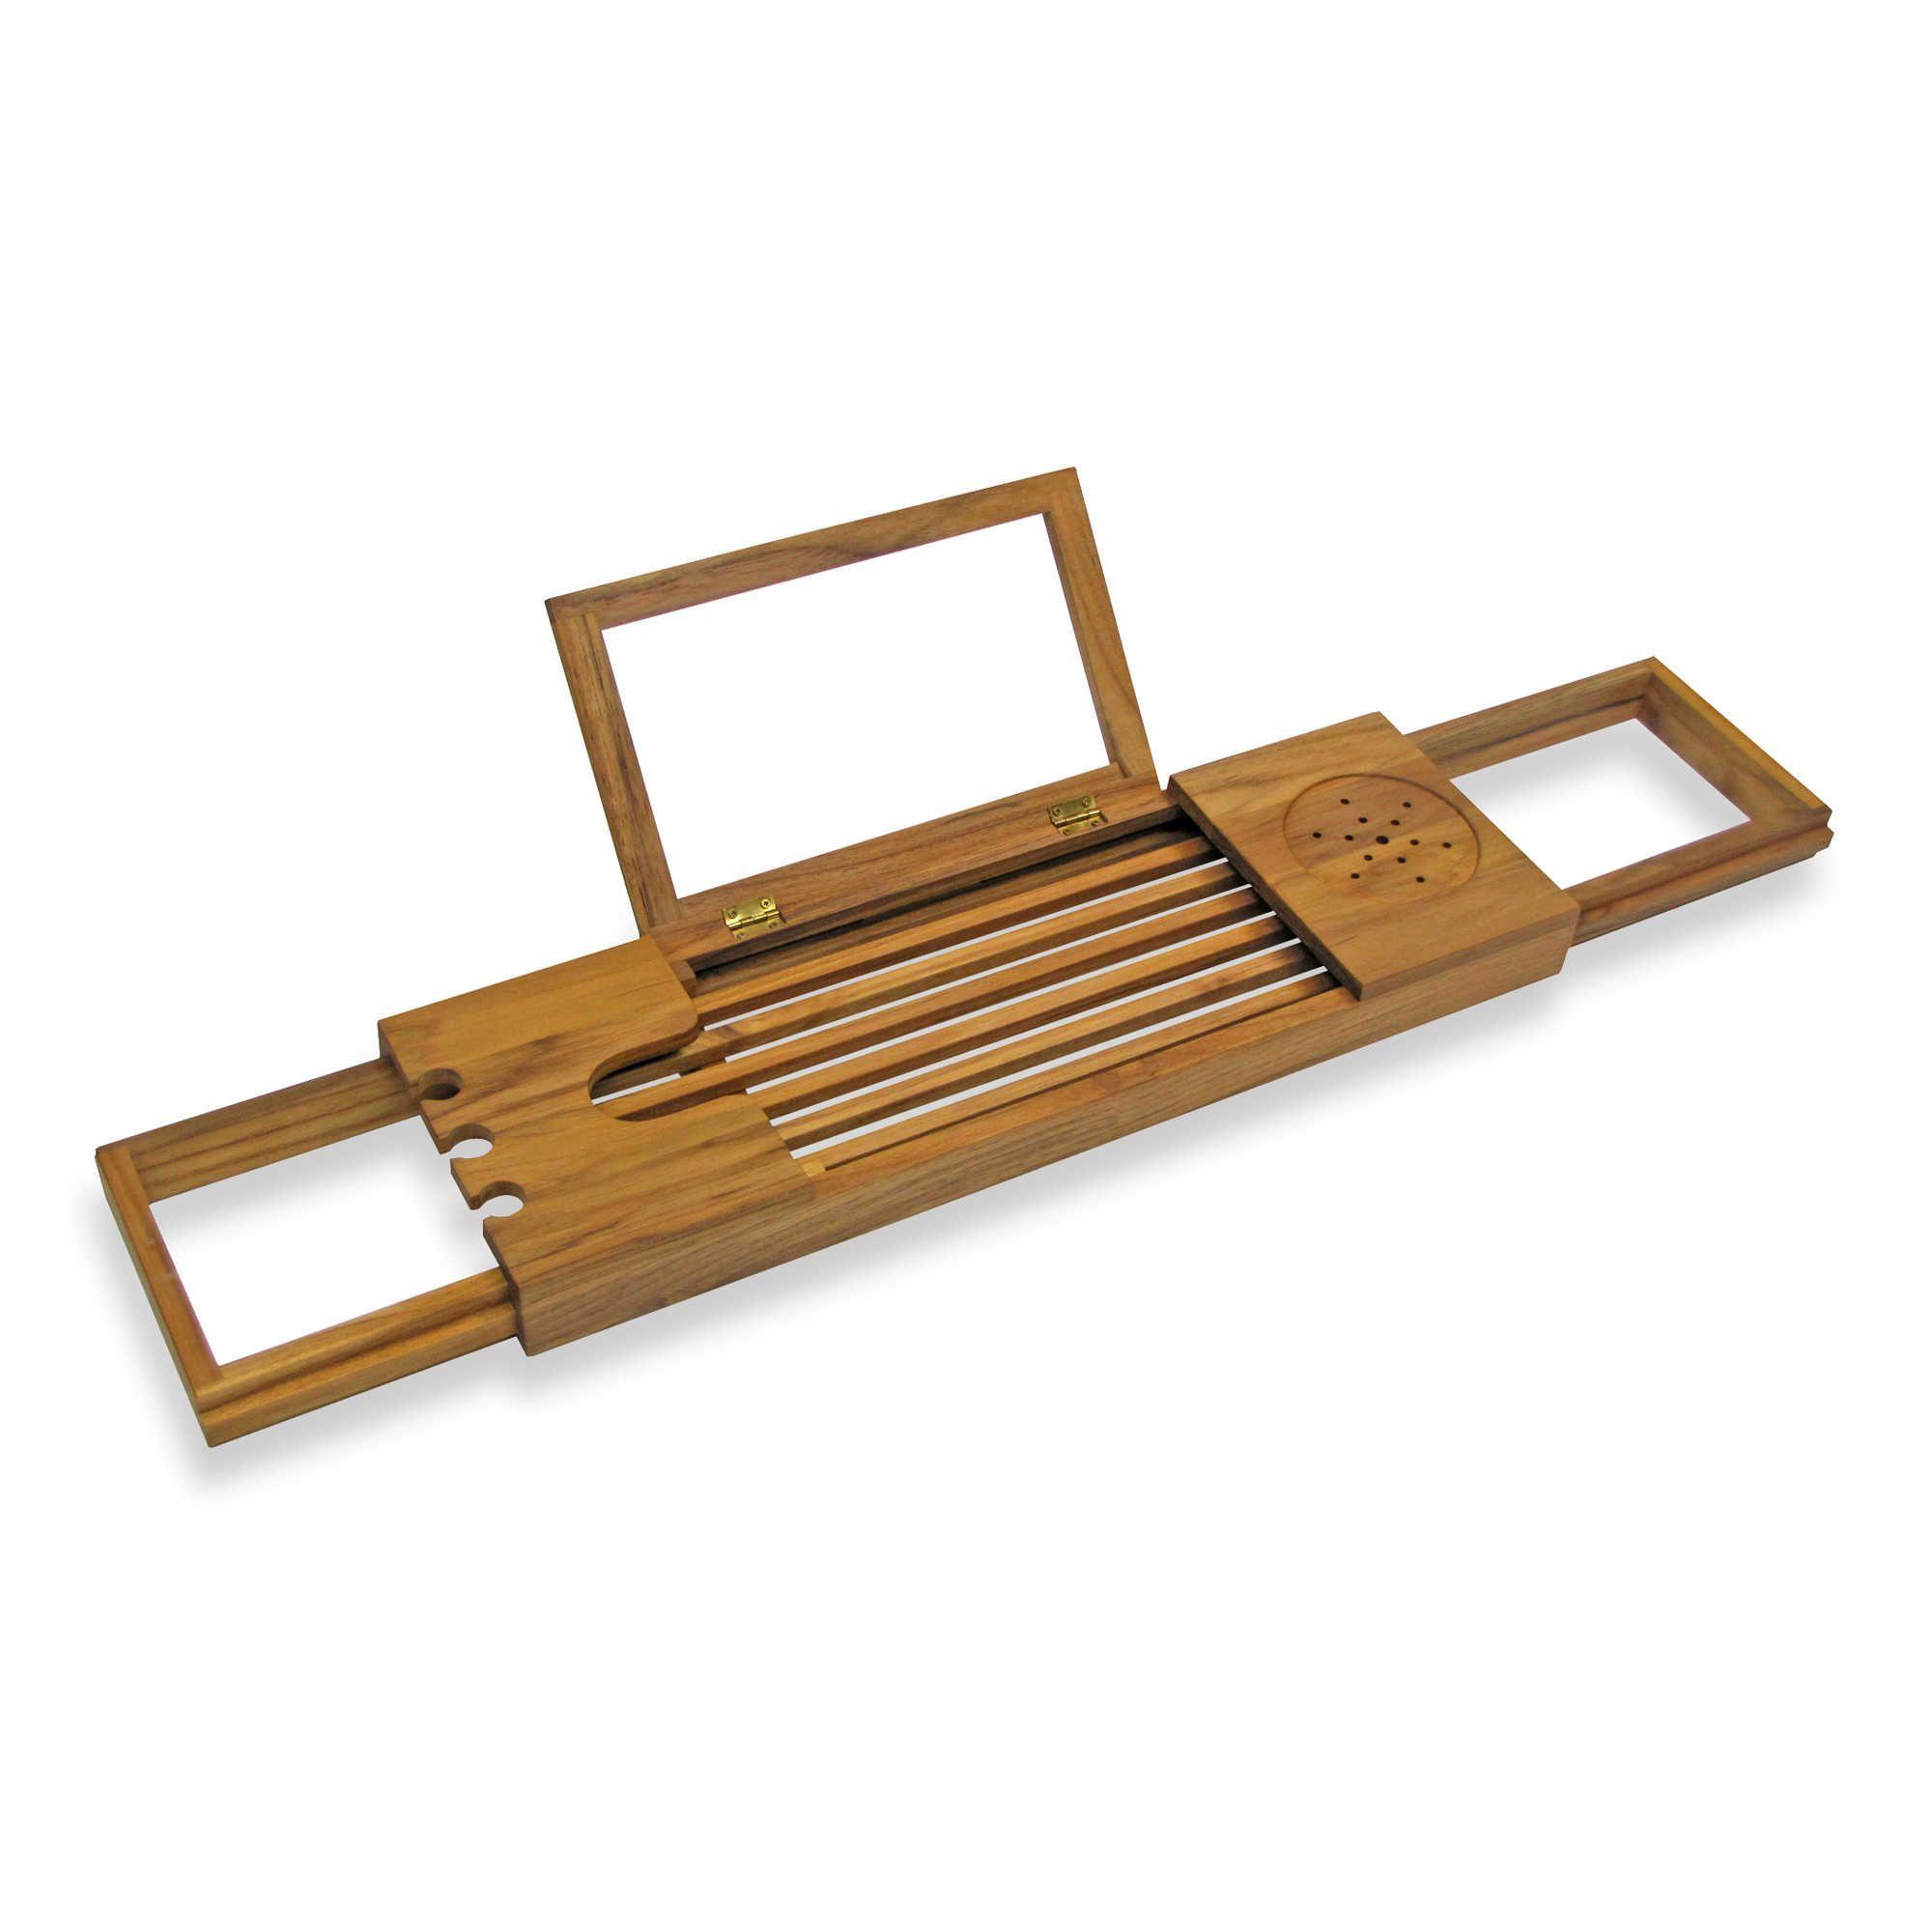 Teak Bathtub Tray Caddy | Home Sweet Home Ideas | Pinterest ...